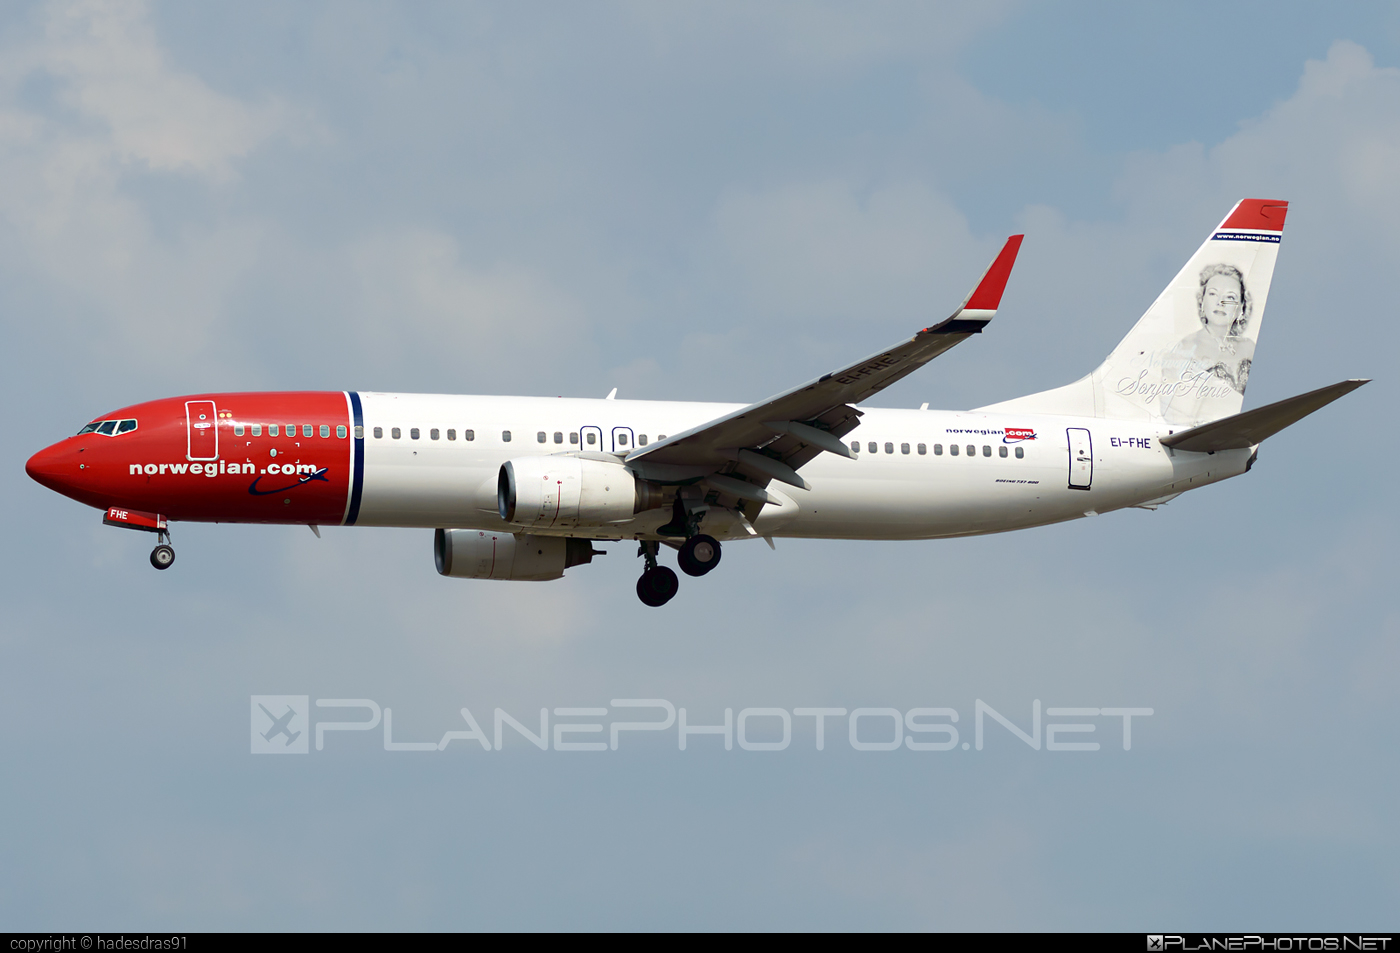 Boeing 737-800 - EI-FHE operated by Norwegian Air International #b737 #b737nextgen #b737ng #boeing #boeing737 #norwegian #norwegianair #norwegianairinternational